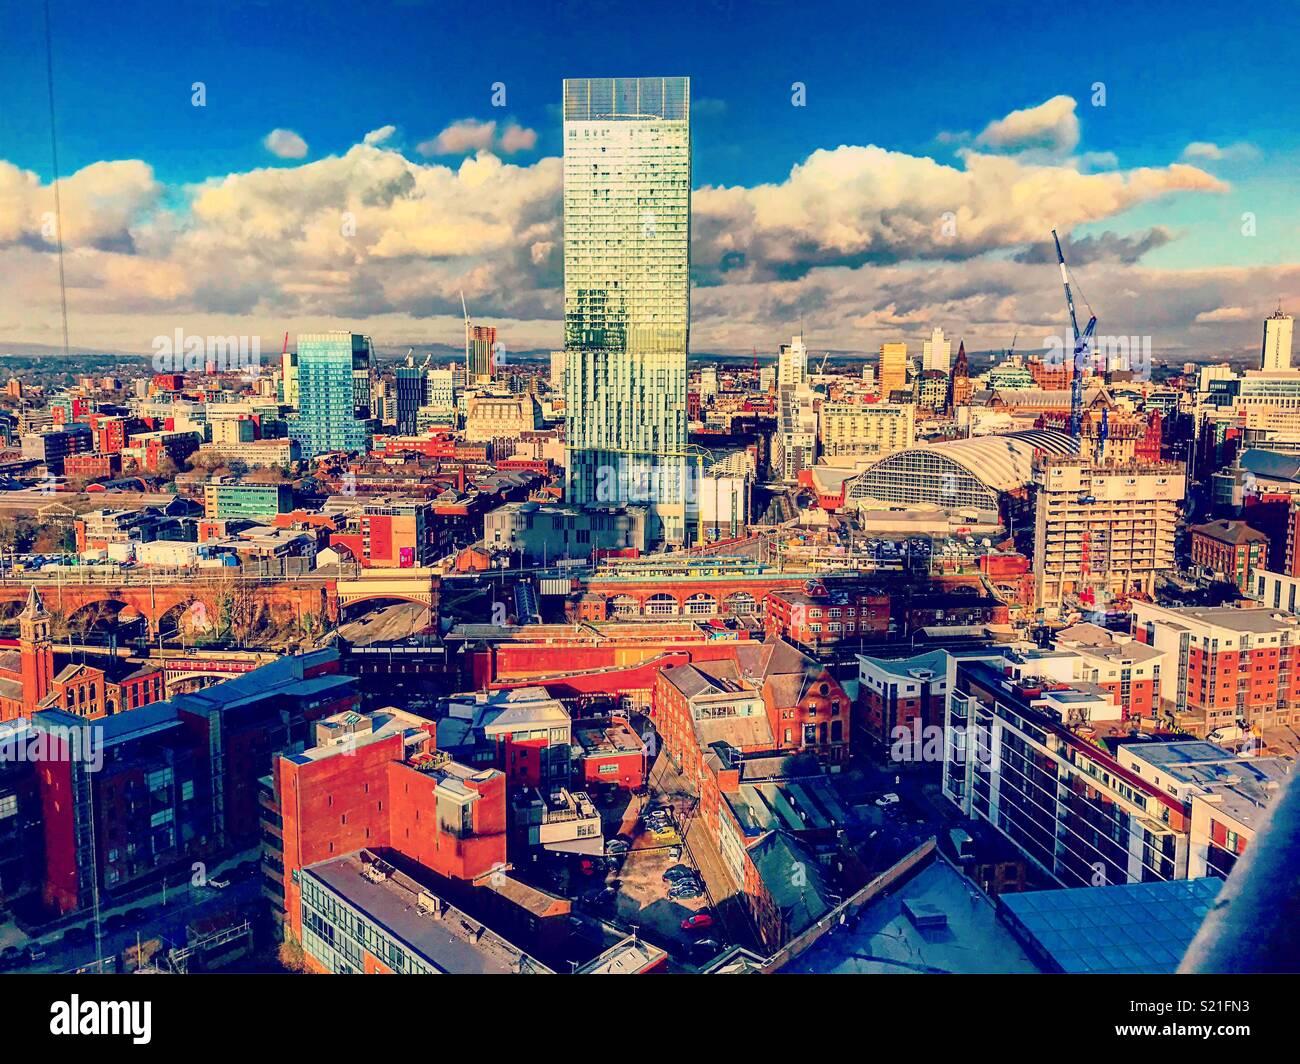 Ain't no city quite like mine. - Stock Image